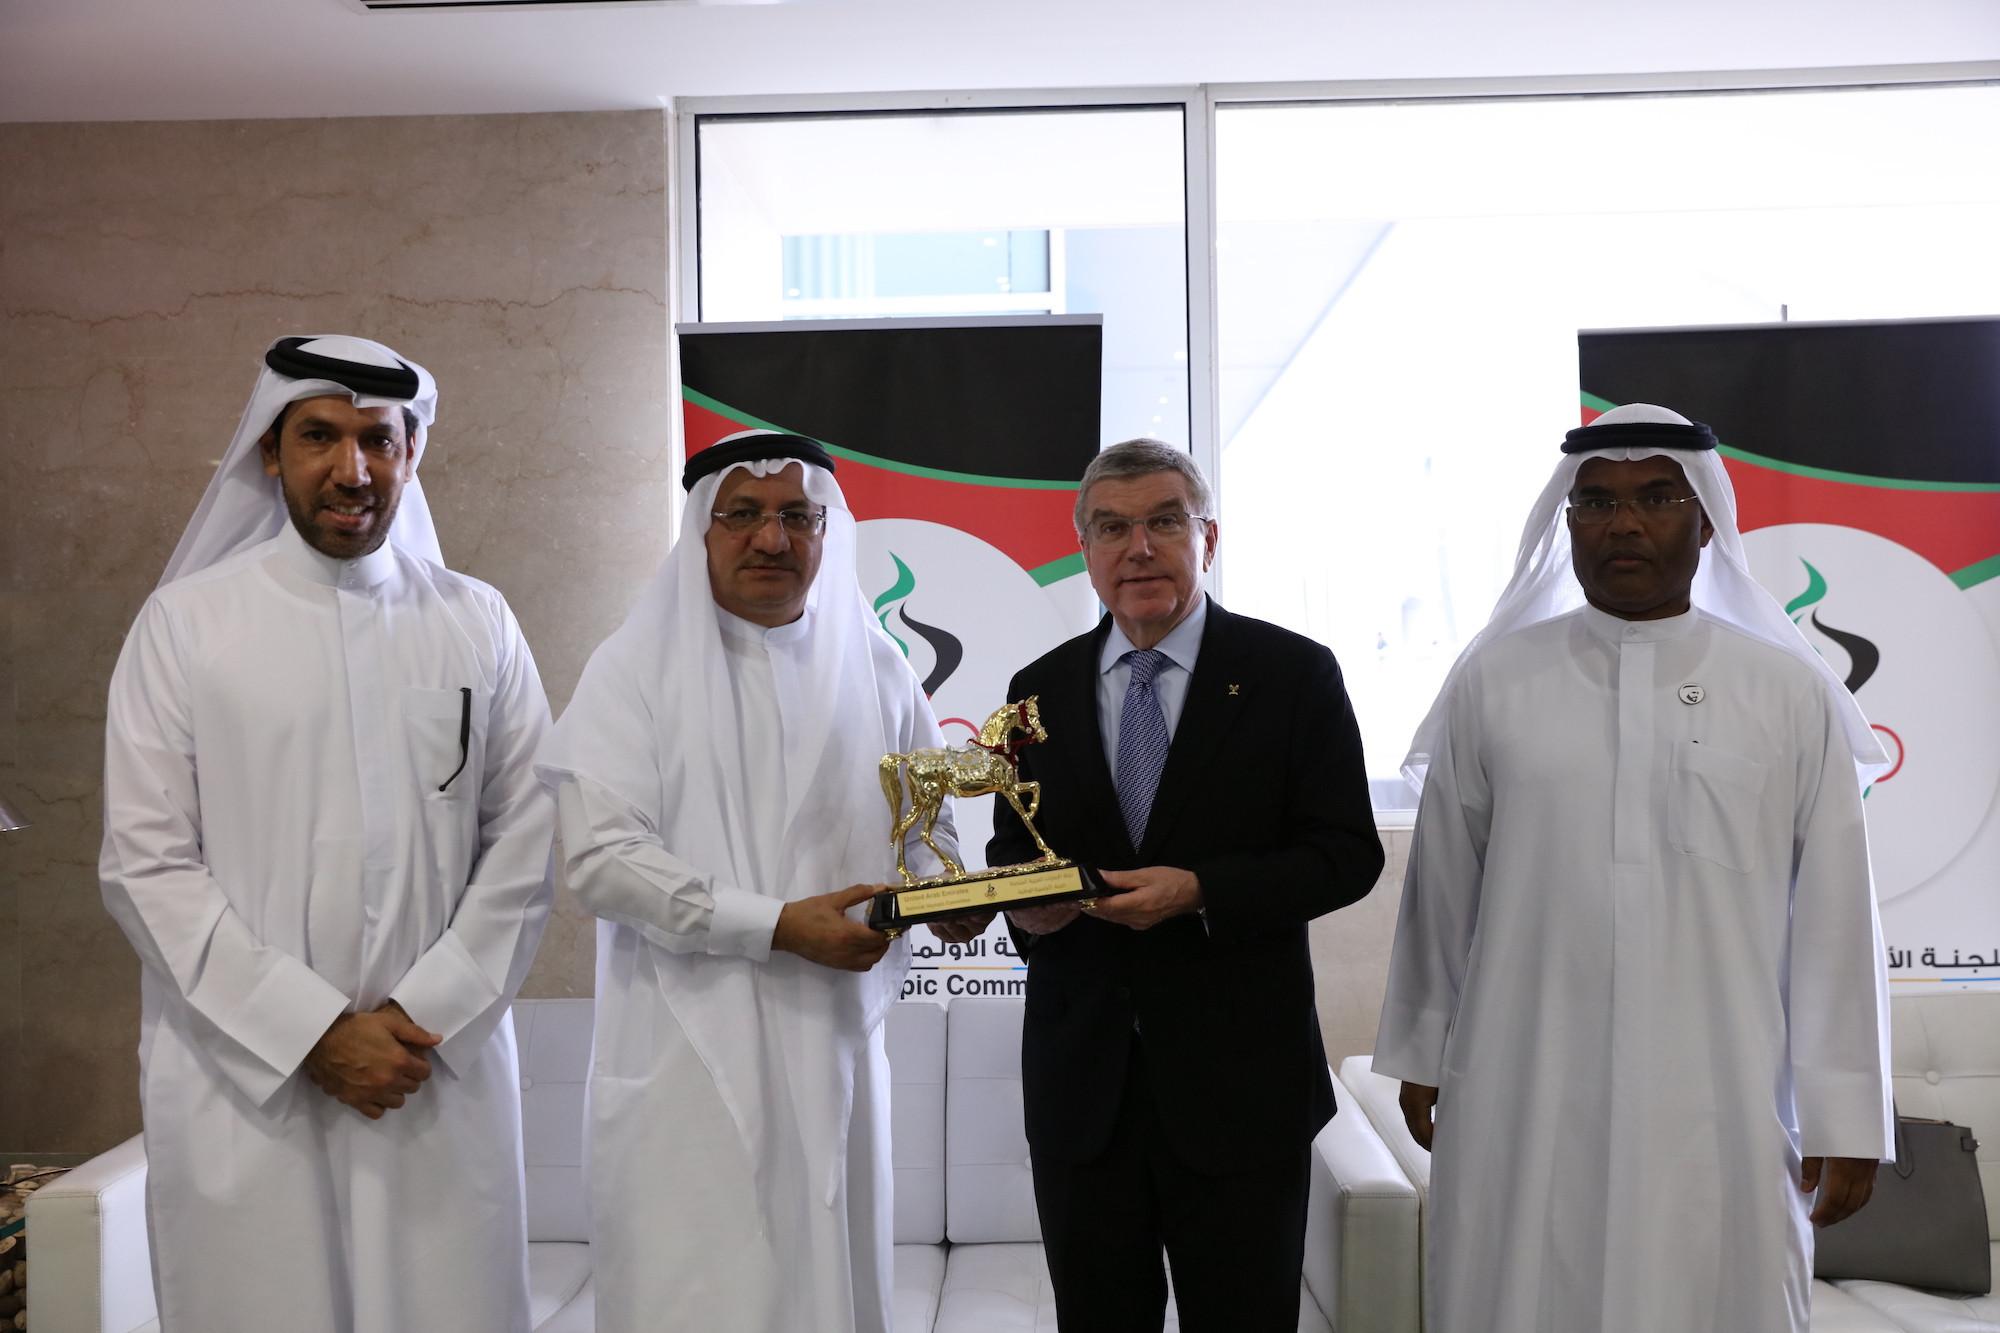 Bach praises hosting skills of United Arab Emirates